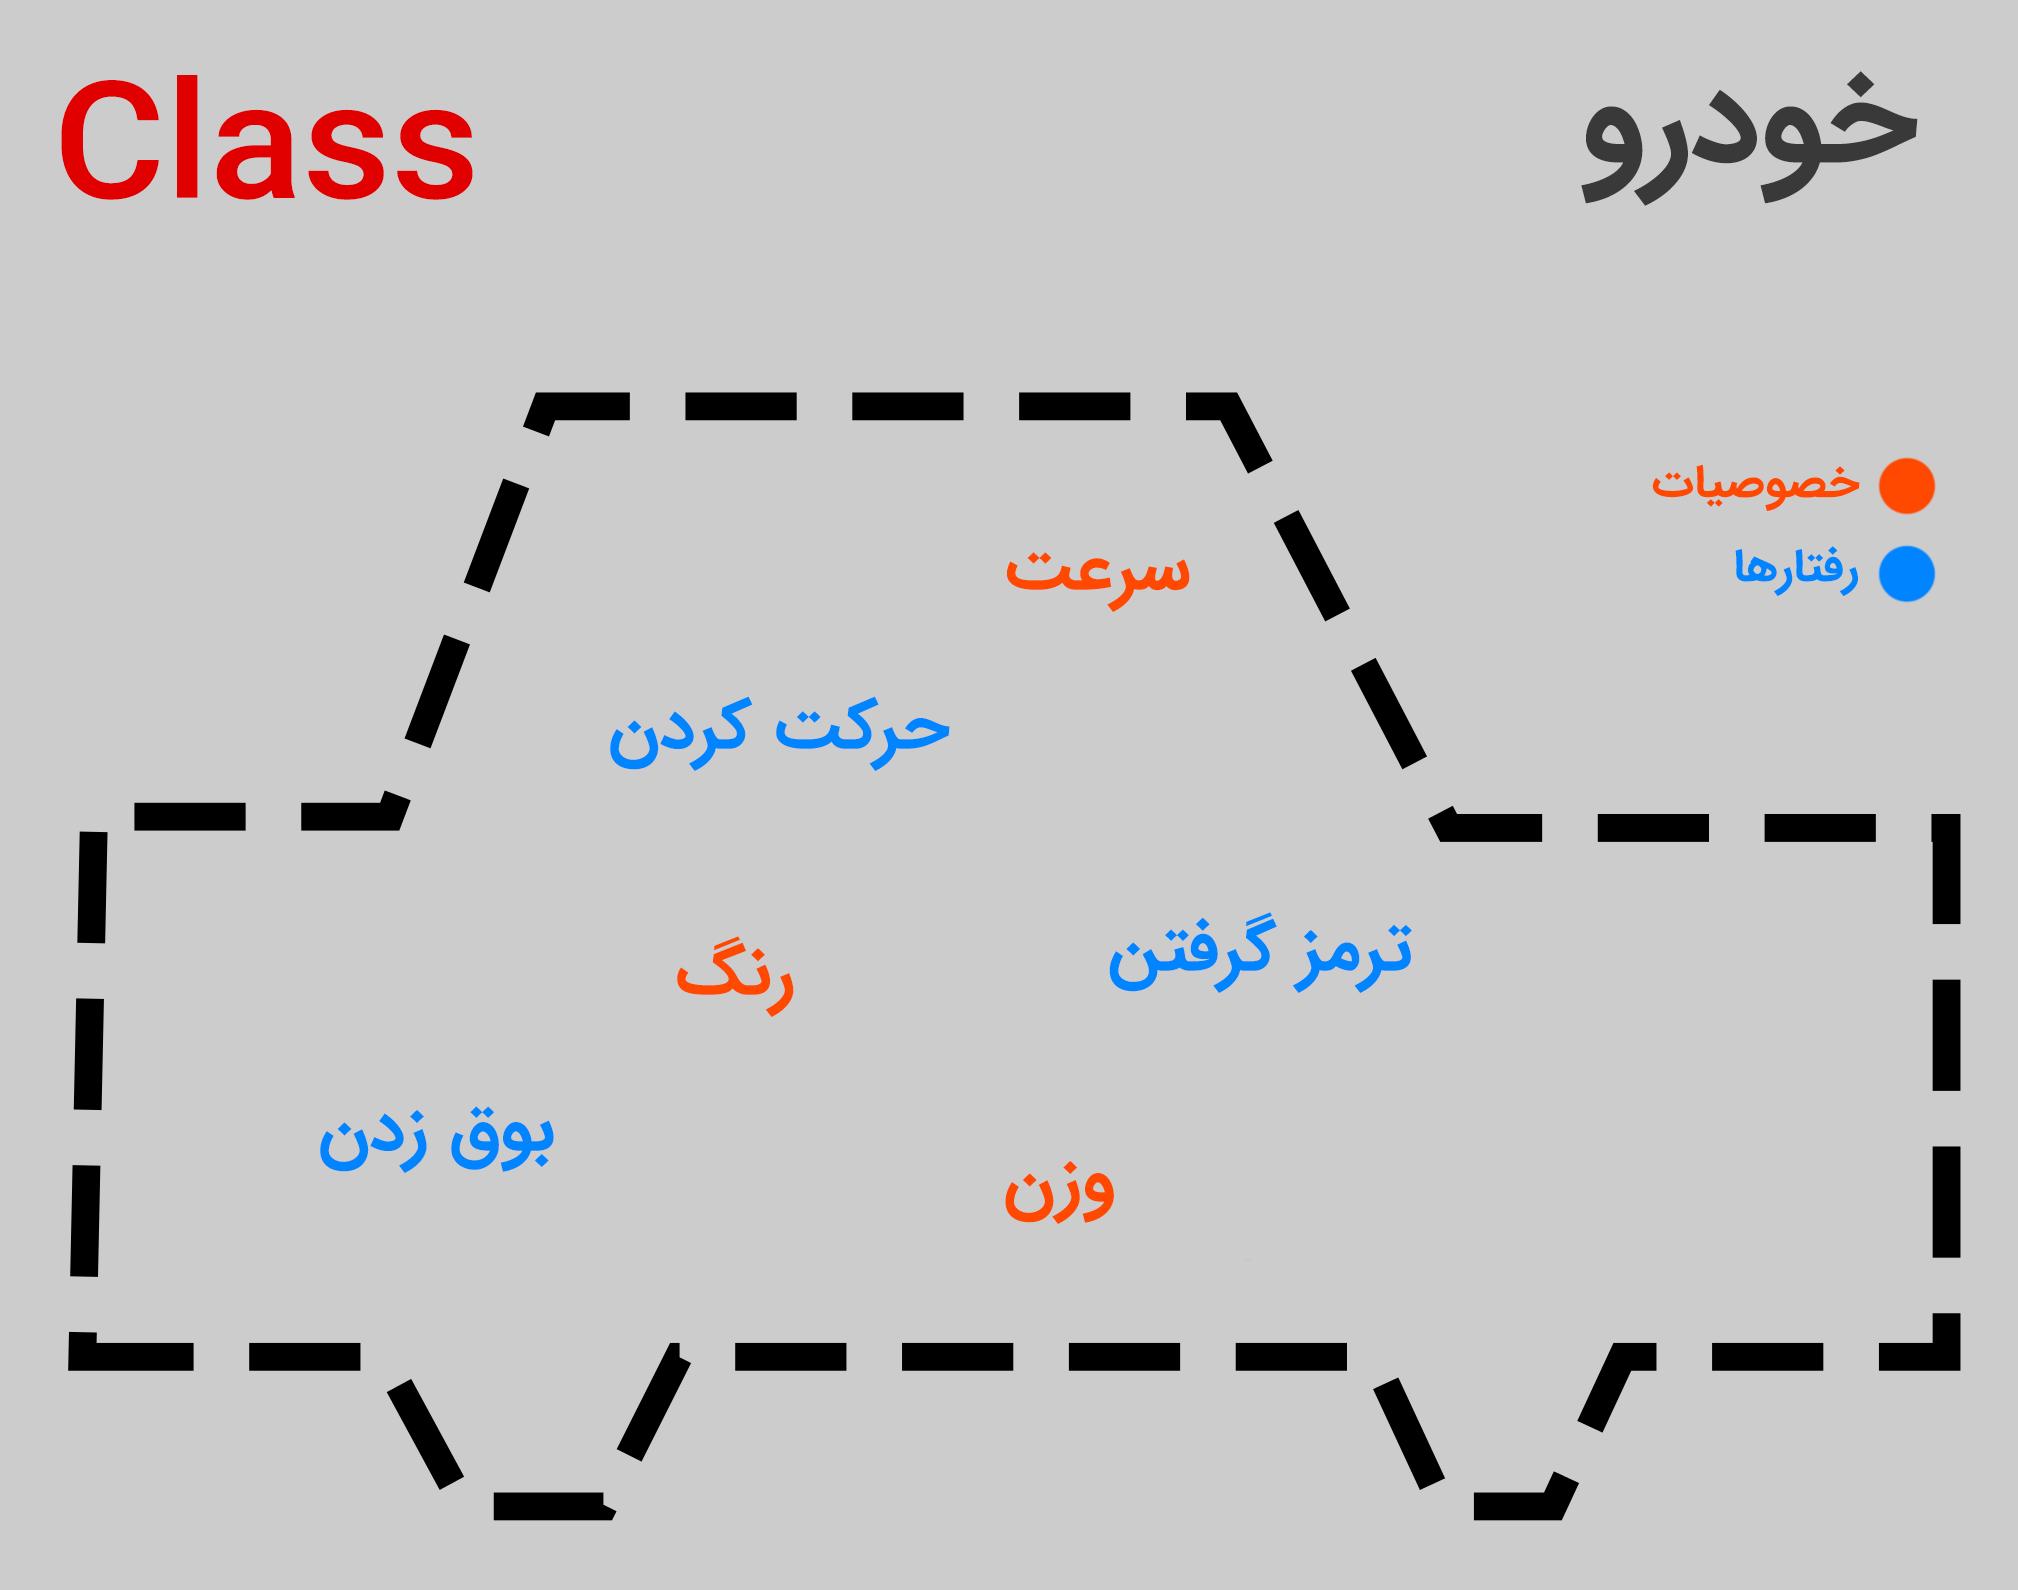 What is the concept of class in objectism برنامه جذاب و جالب و خوب نویسی شی گرا چیست؟